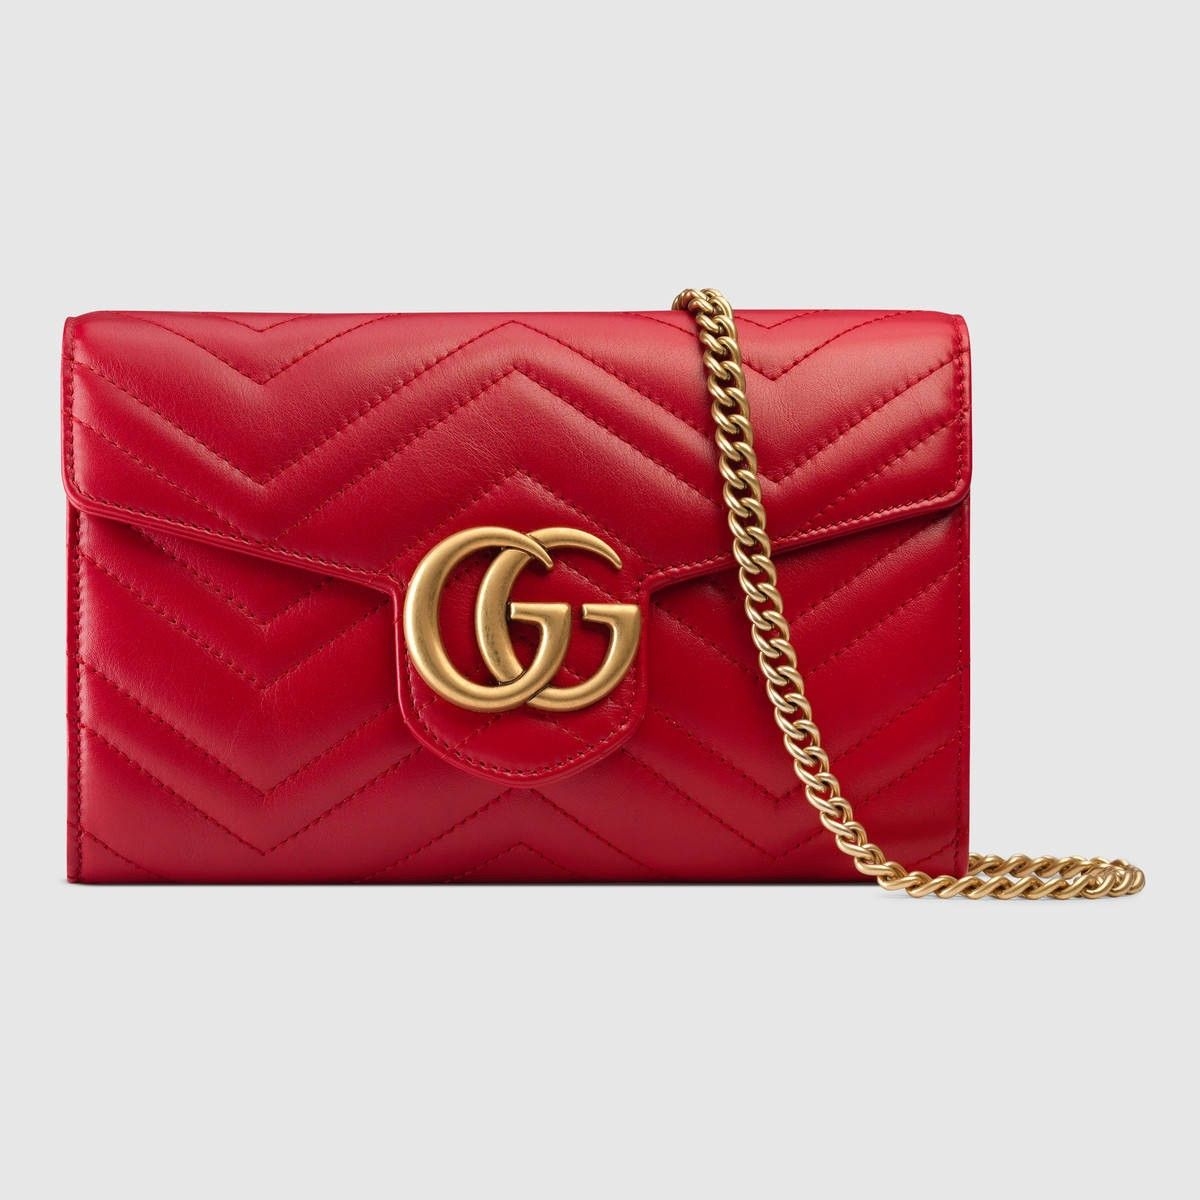 e5c00da30 GUCCI Gg Marmont Matelassé Mini Bag - Hibiscus Red Leather. #gucci #bags  #shoulder bags #wallet #leather #accessories #